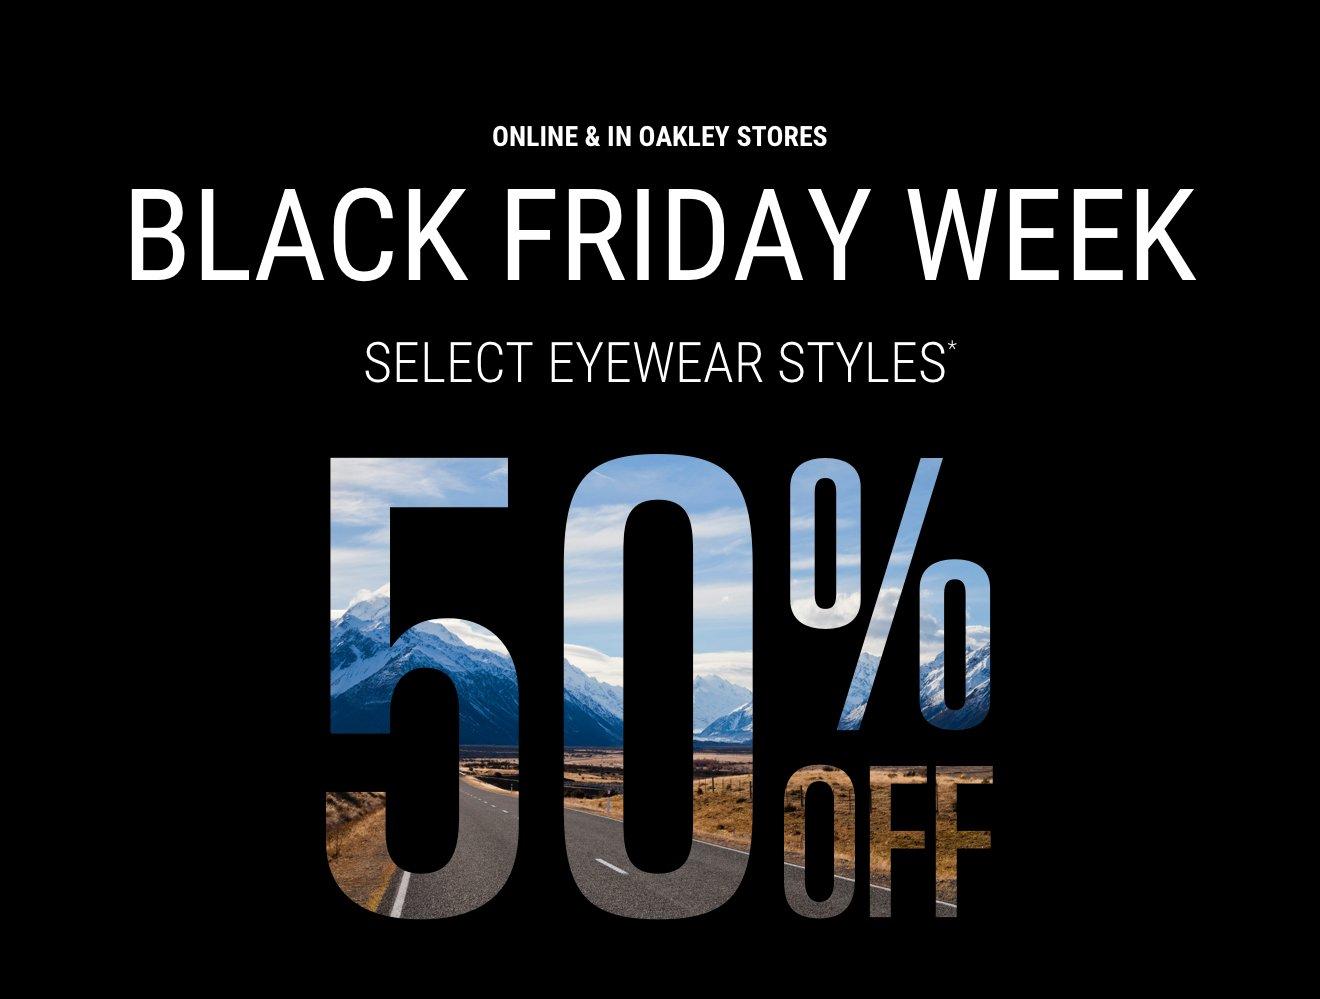 BLACK FRIDAY WEEK SELECT EYEWEAR STYLES* 50% OFF